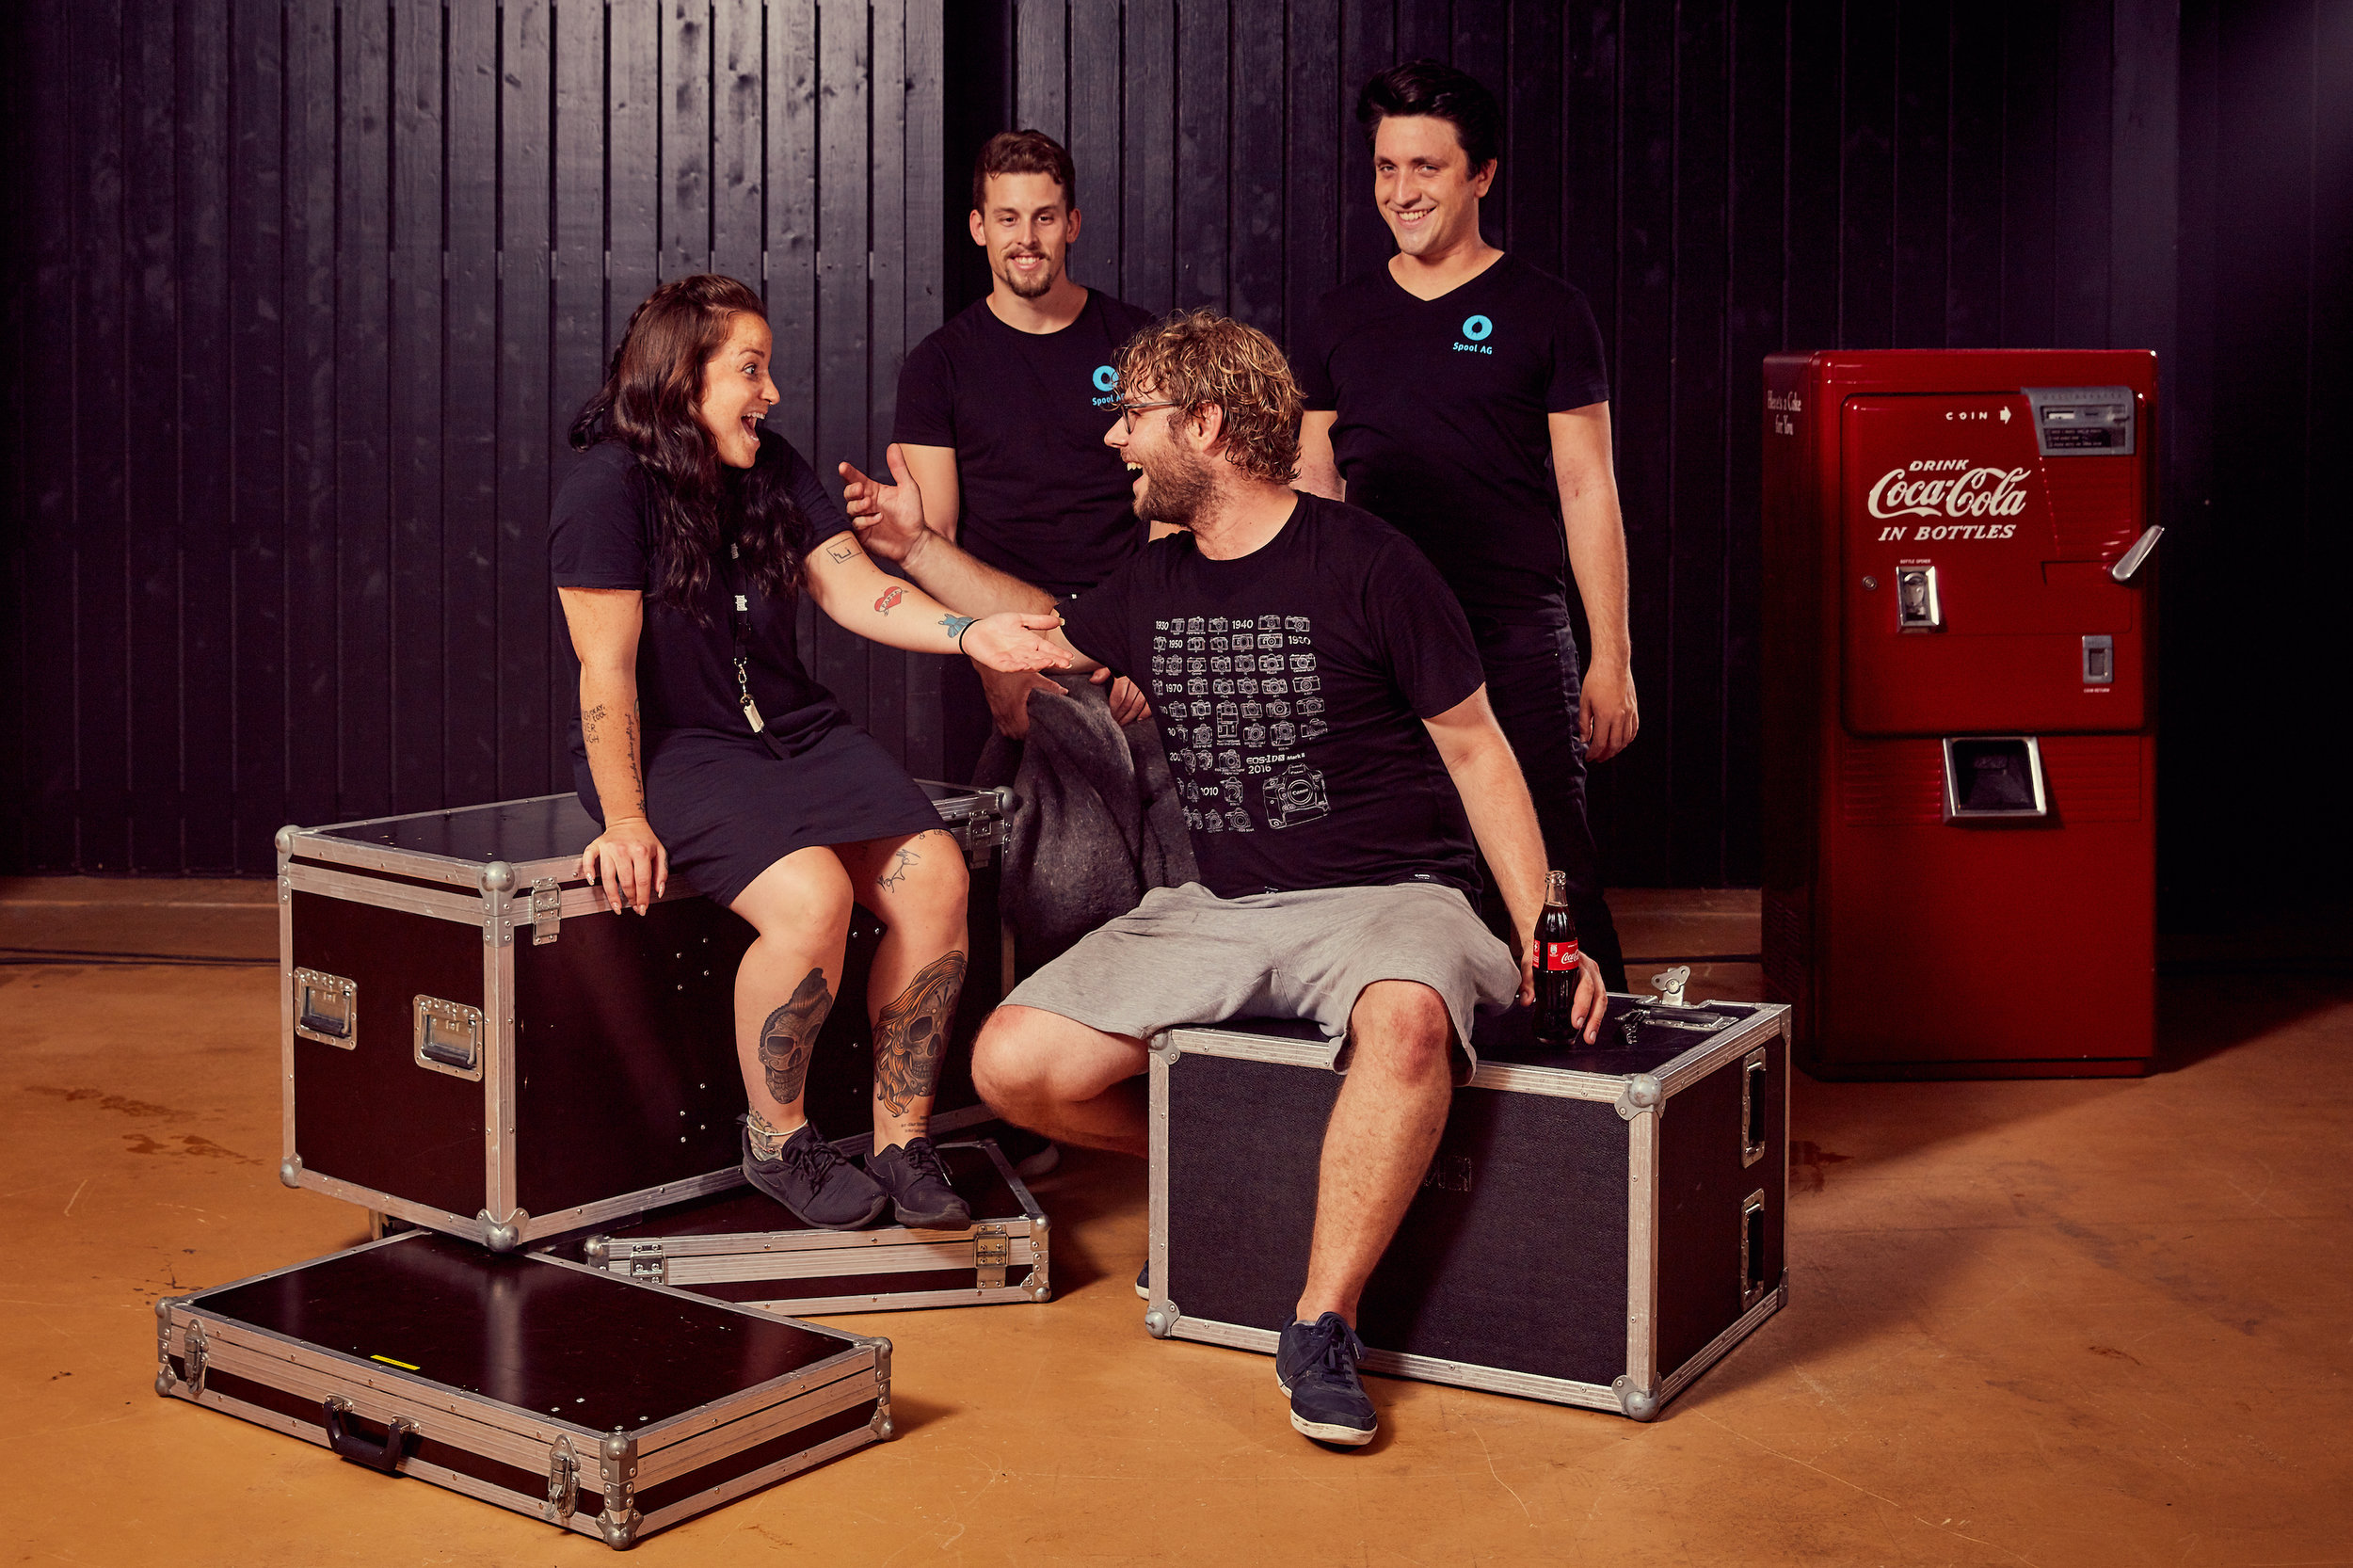 mycokemusic Soundcheck 2017 - Das making of des Bandshootings